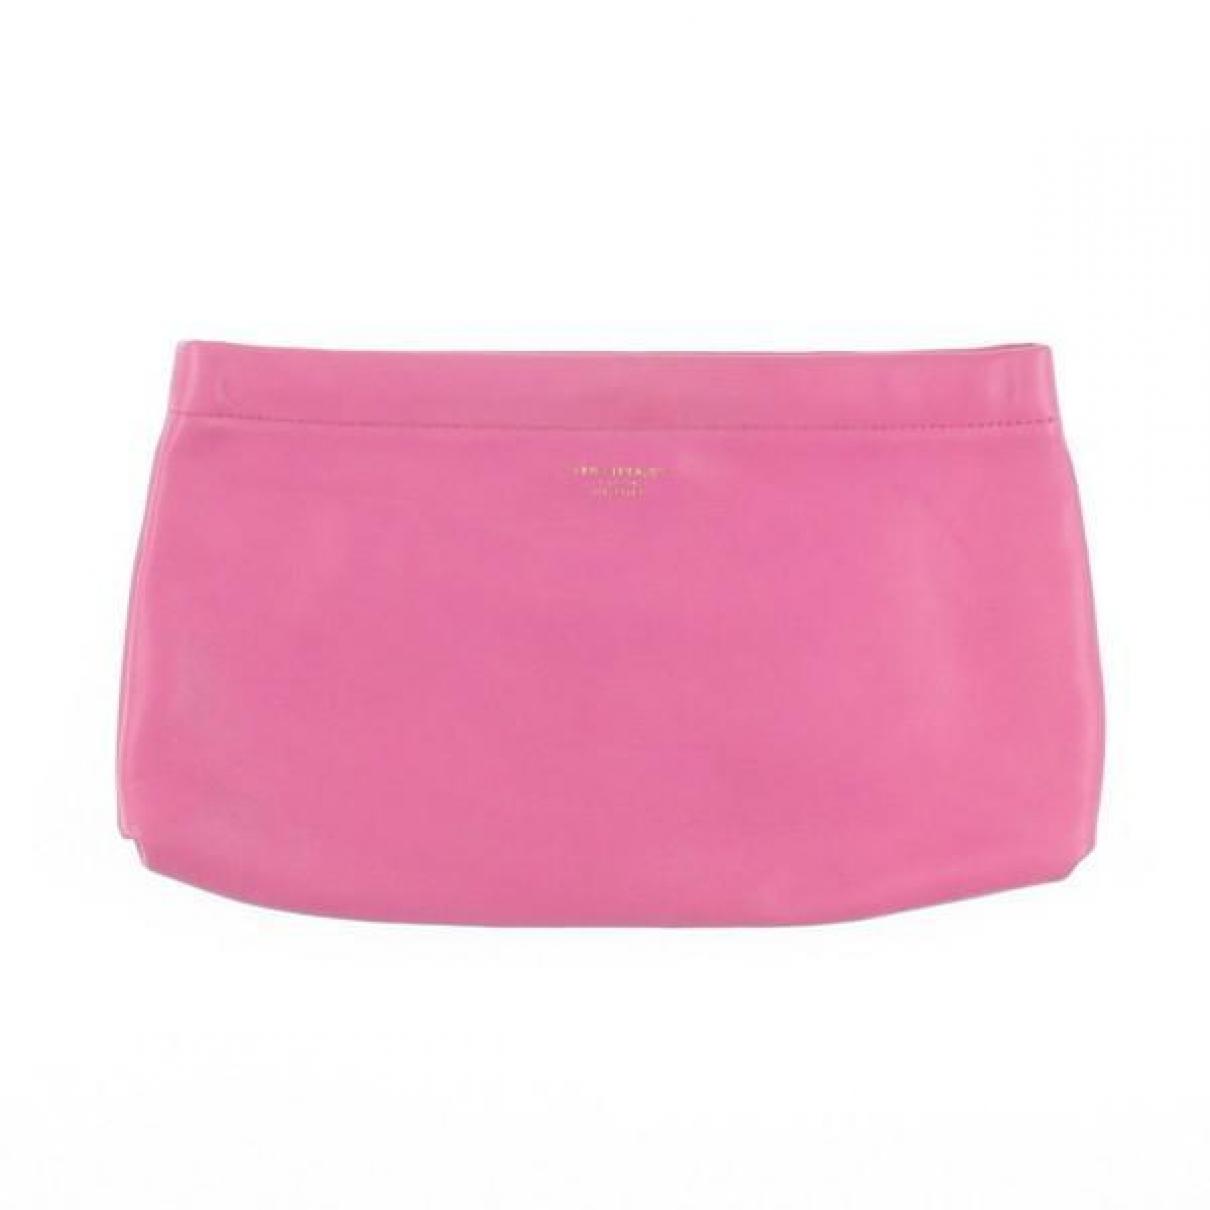 Acne Studios \N Pink Leather Clutch bag for Women \N